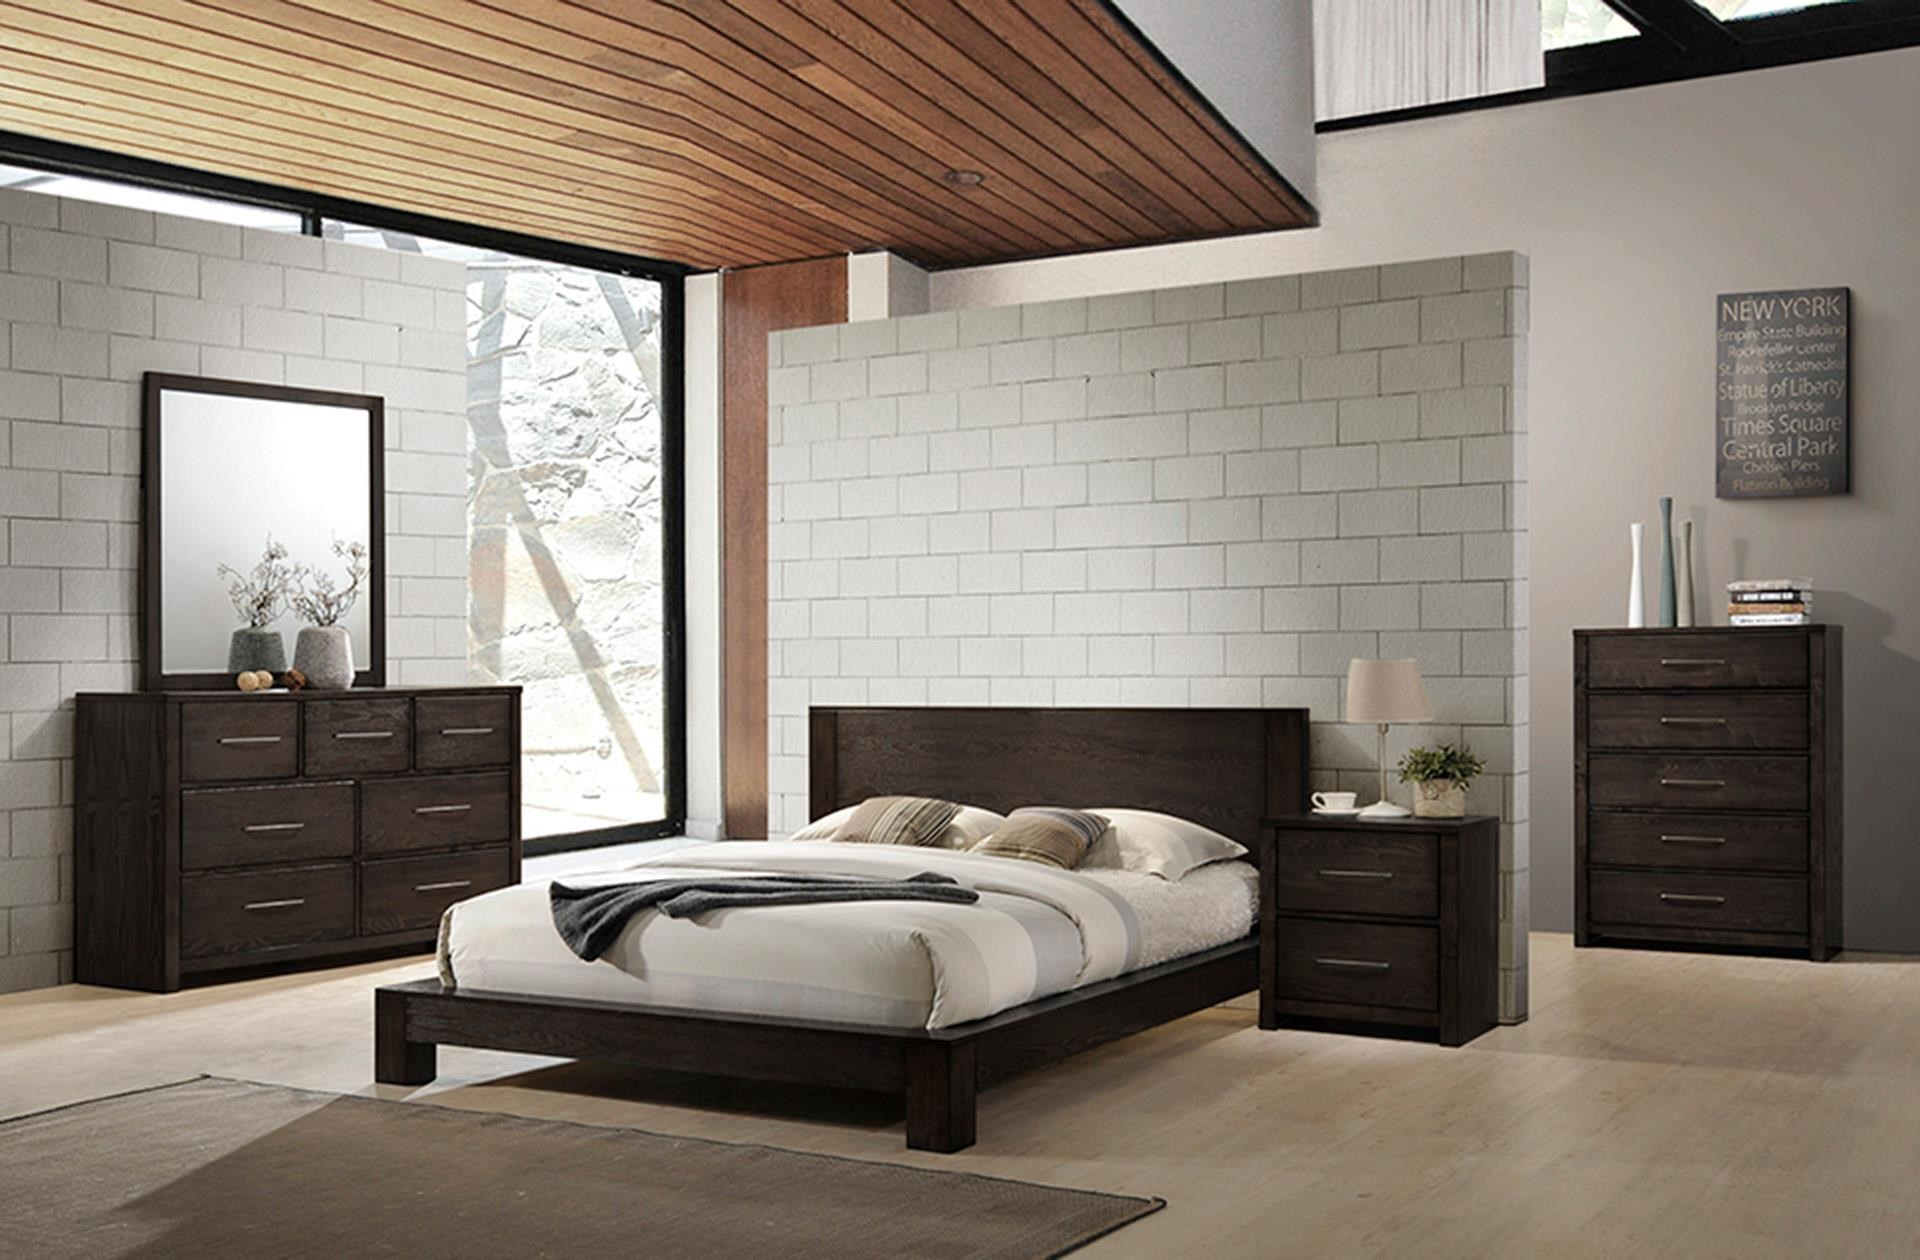 Queen Platform Bed, Dresser, Mirror, and Nig